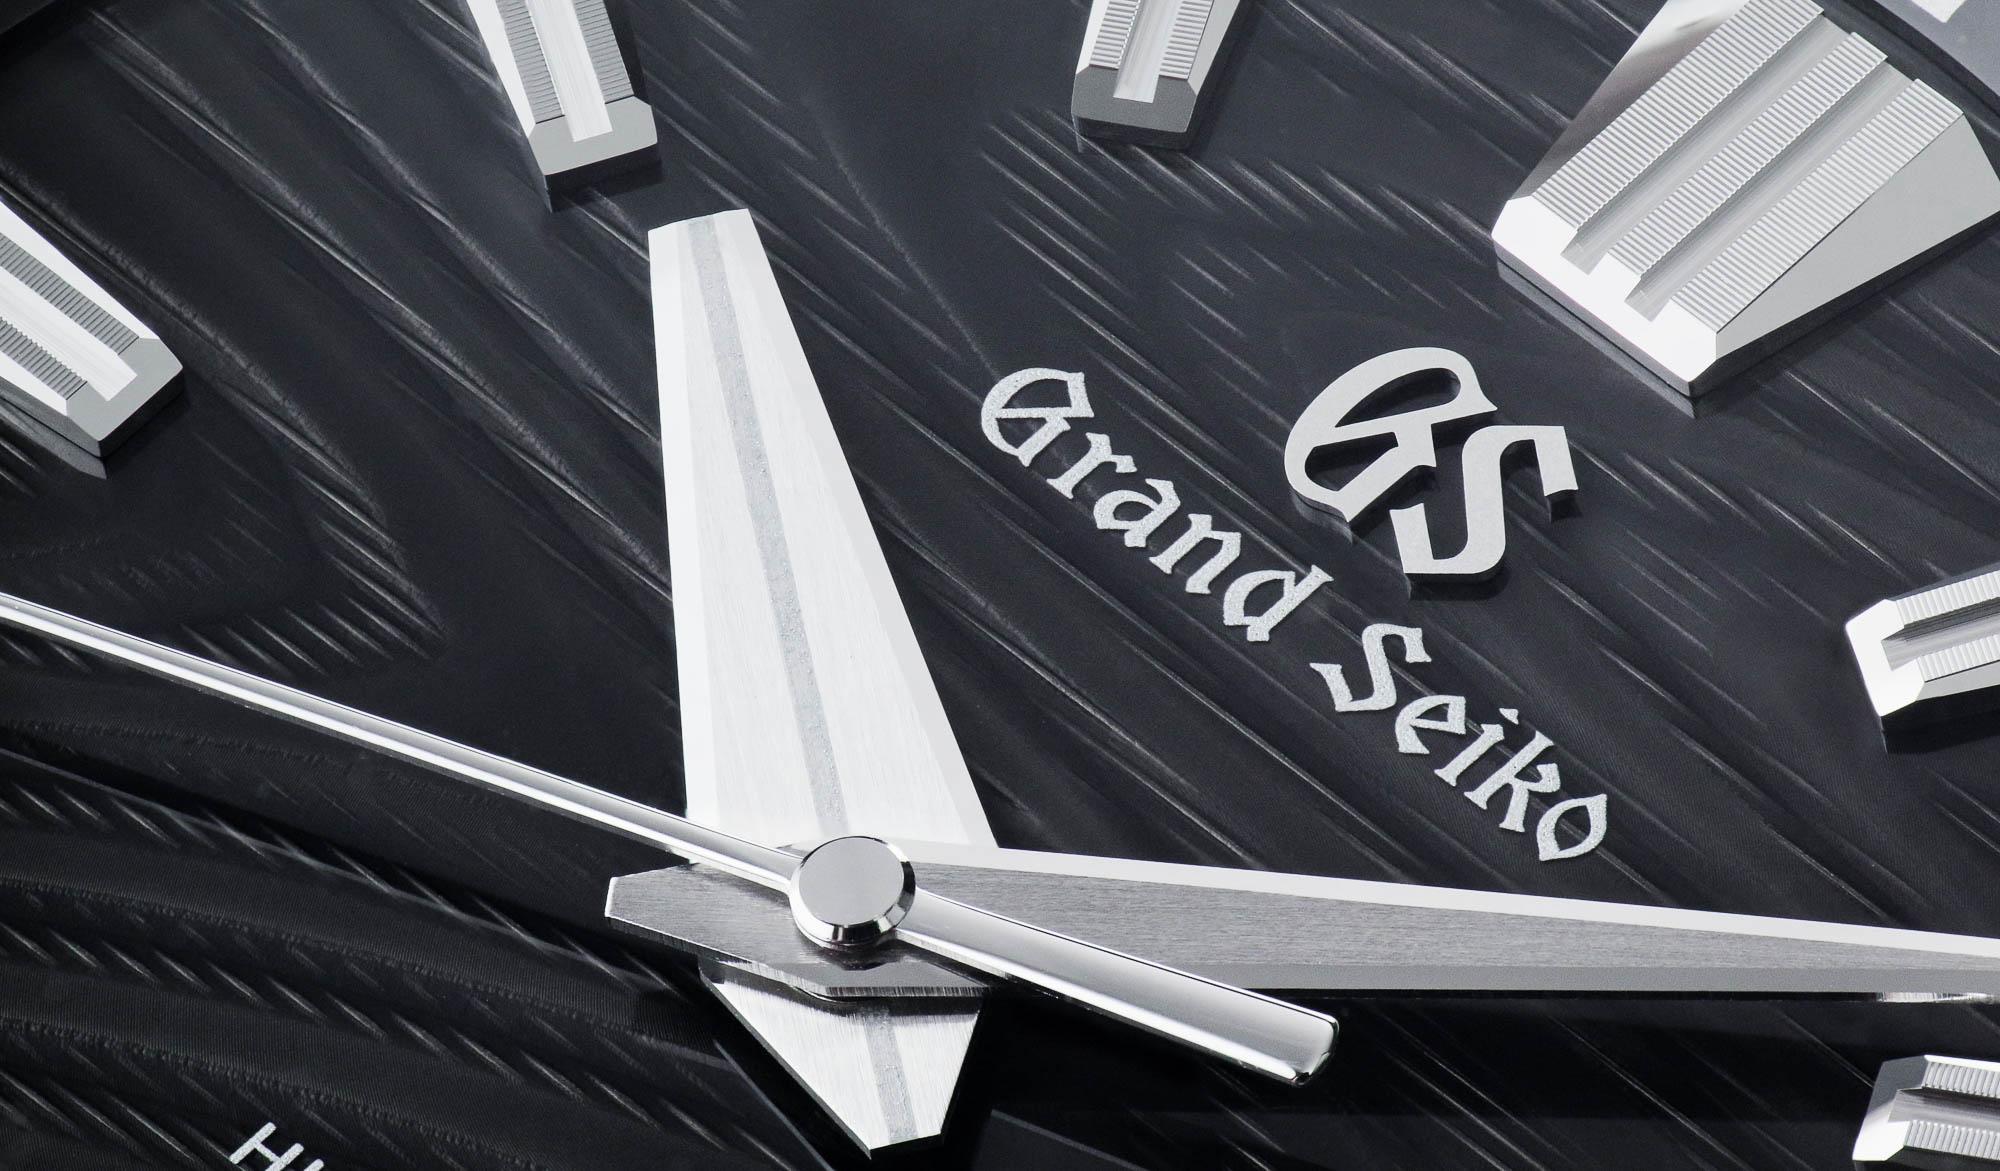 Grand Seiko SLGH007 macro of dial